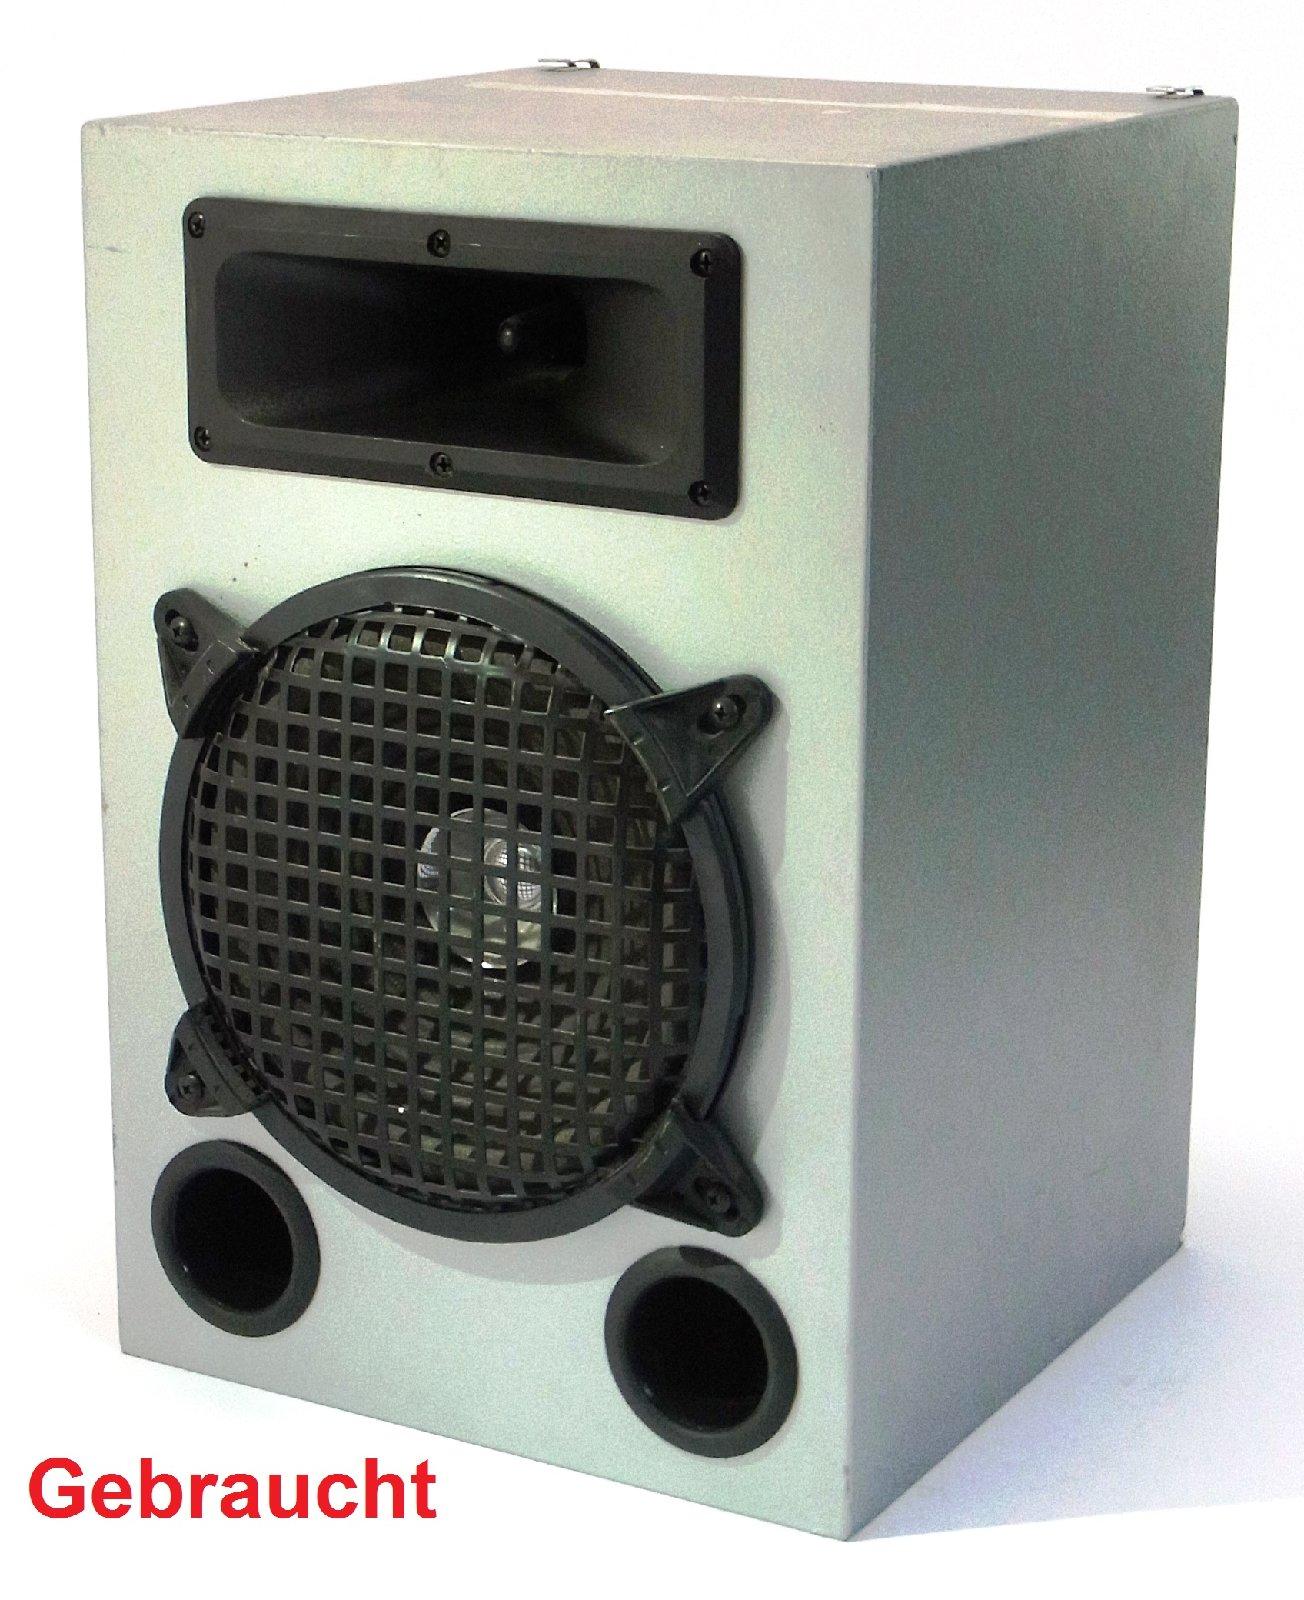 1 lautsprecher 3 wege box no name lautsprecherboxen boxen passiv ebay. Black Bedroom Furniture Sets. Home Design Ideas